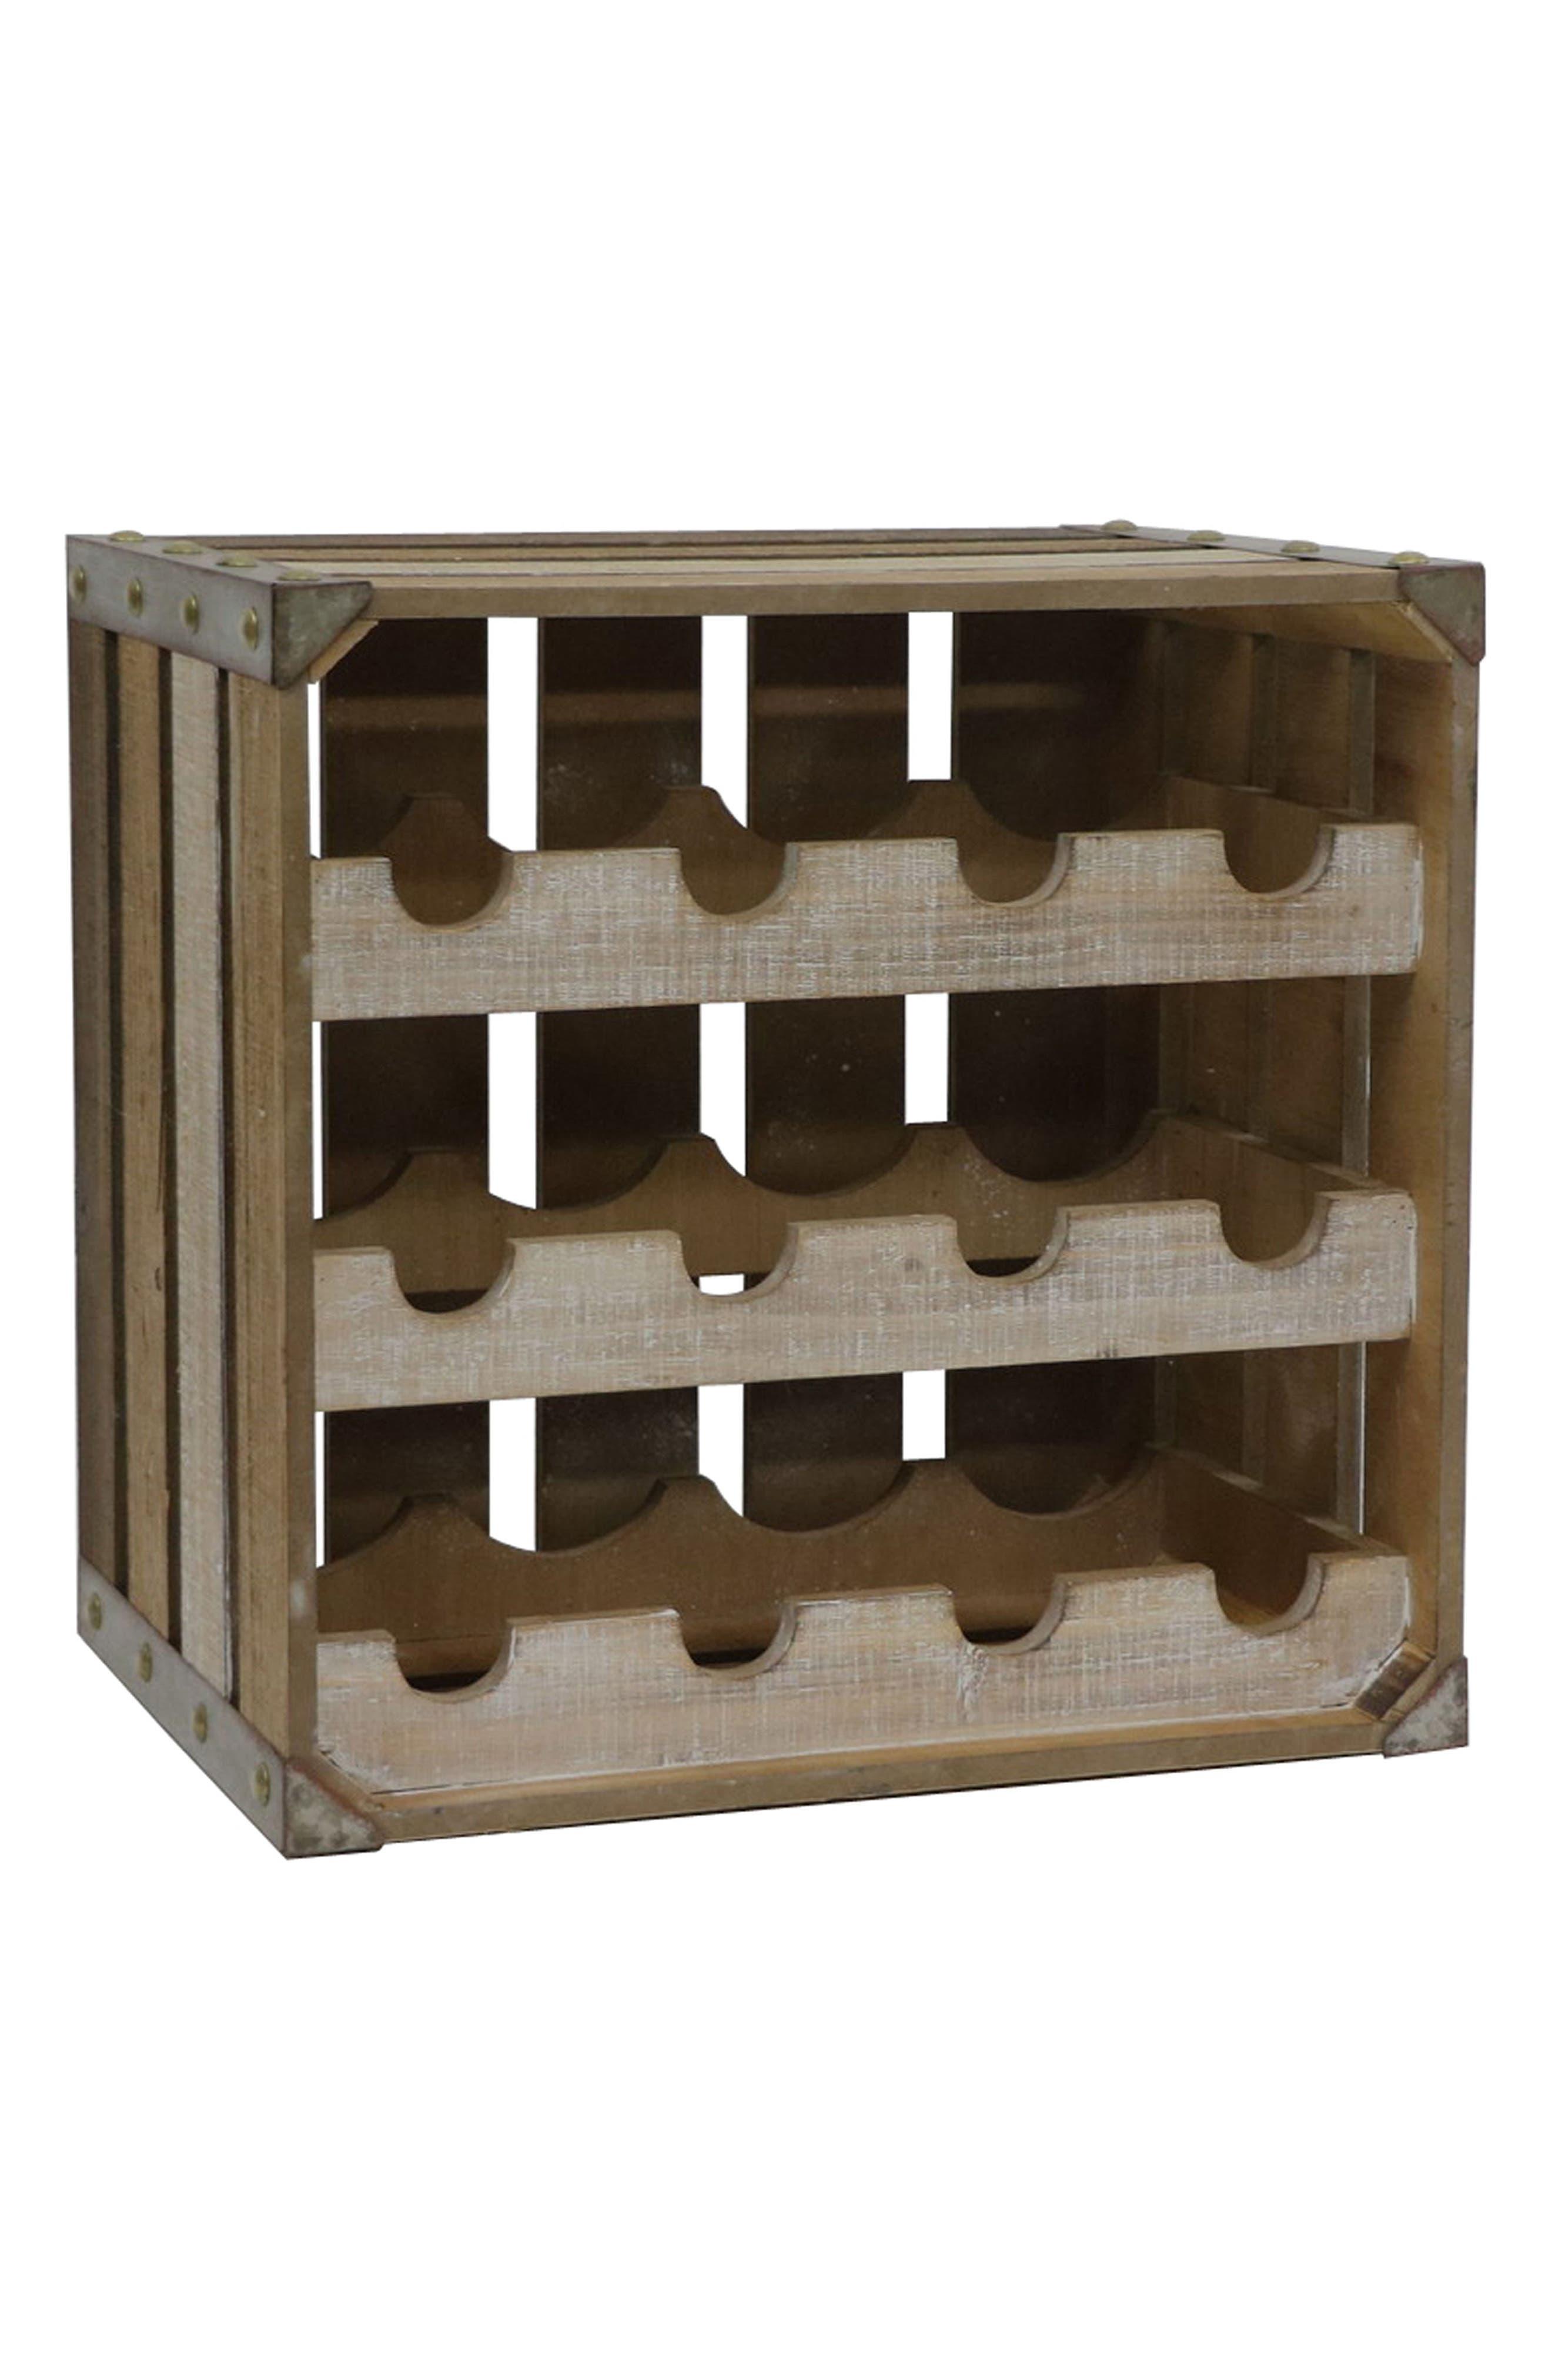 Crystal Art Gallery Wooden Wine Crate